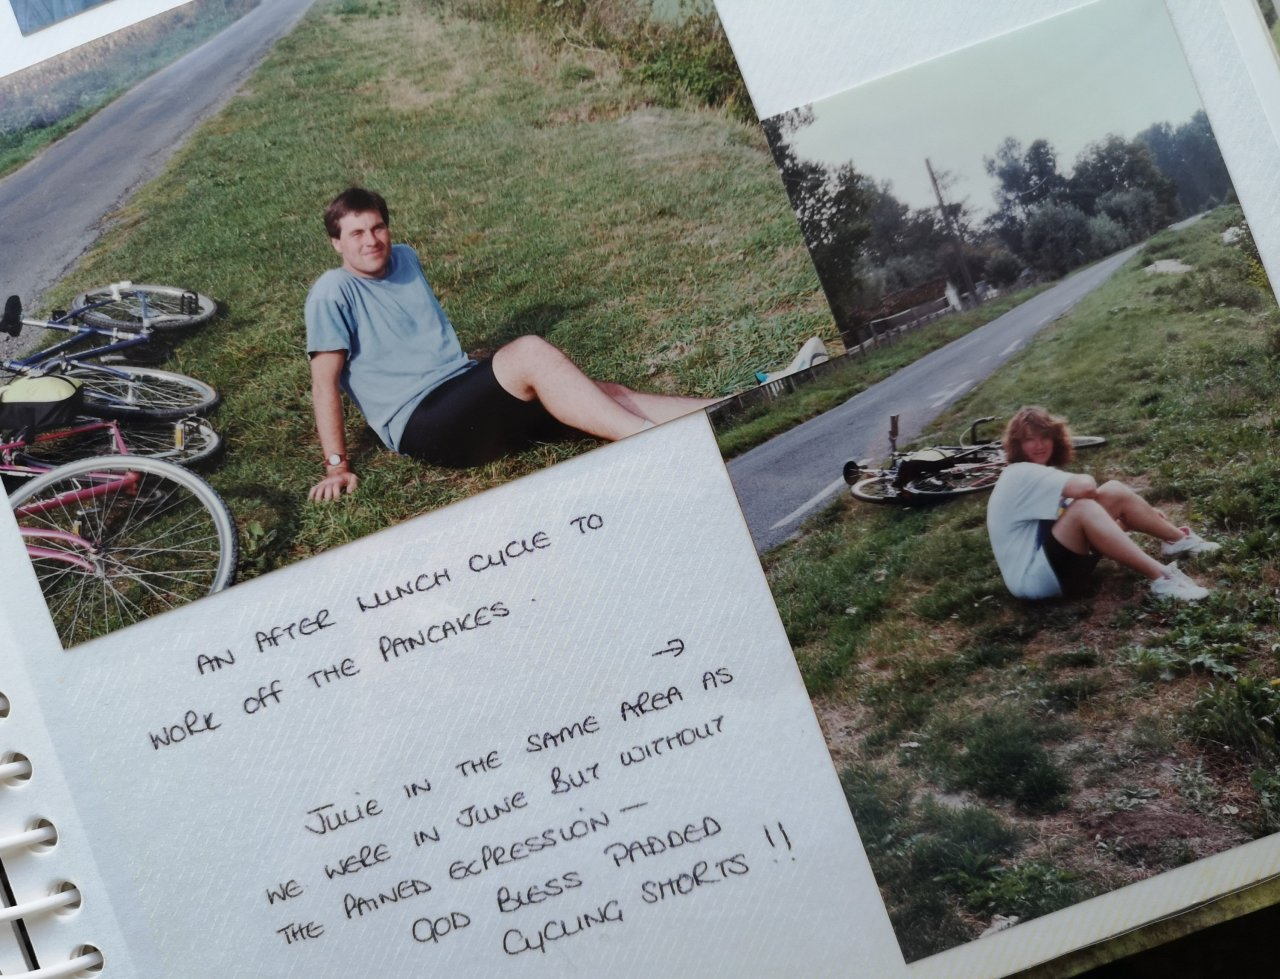 Saddlebag of Memories – we have a cycle ride toplan